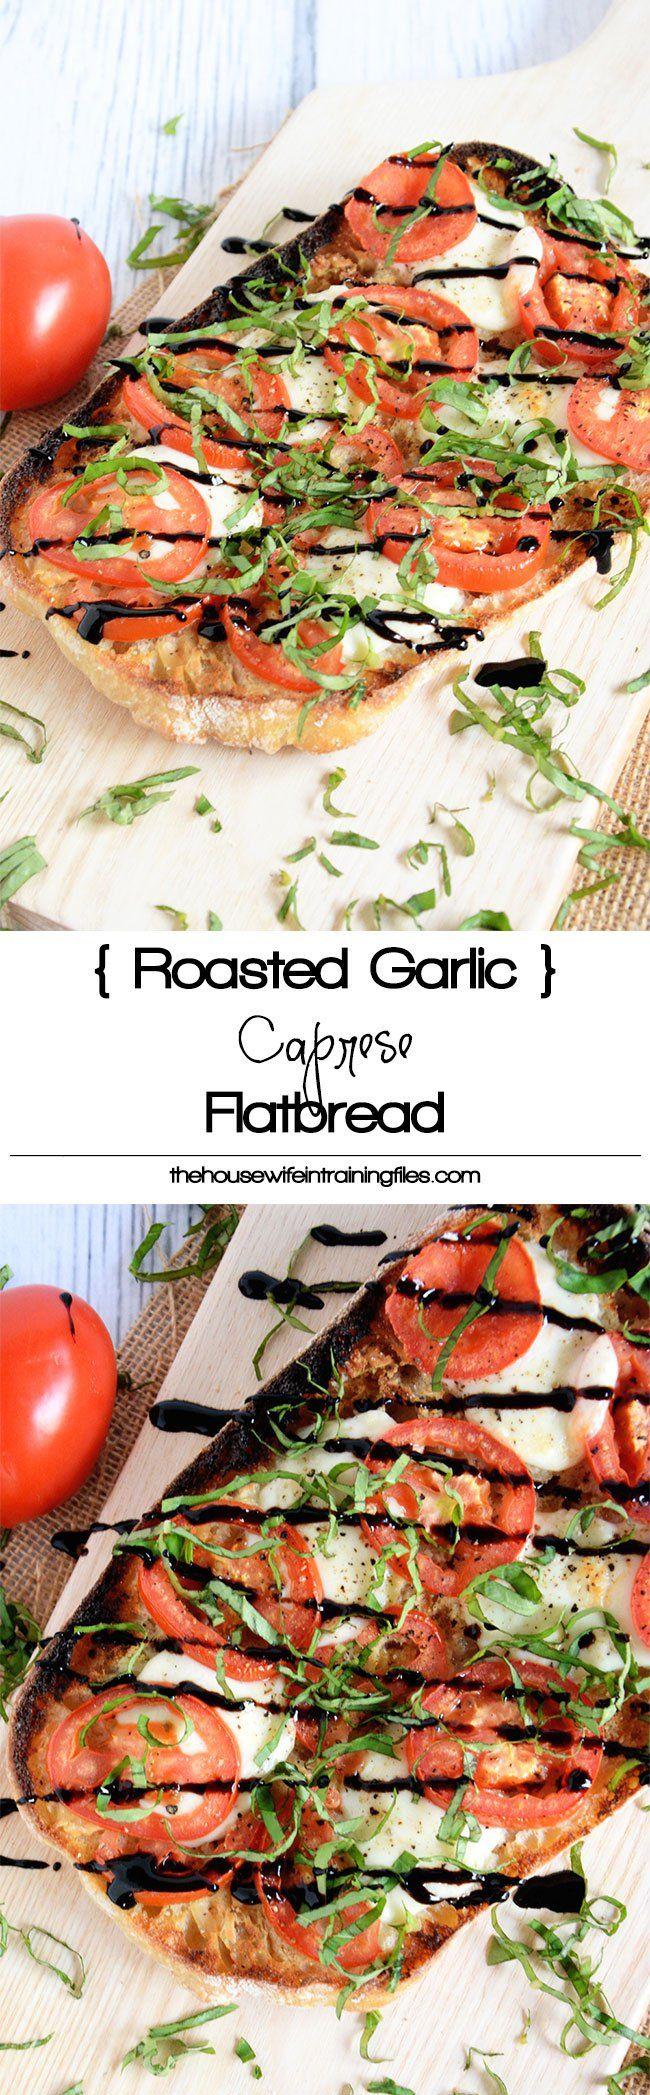 A Caprese Ciabatta Flatbread spiced up with a roasted garlic spread, roma tomatoes, fresh mozzarella and a balsamic drizzle!